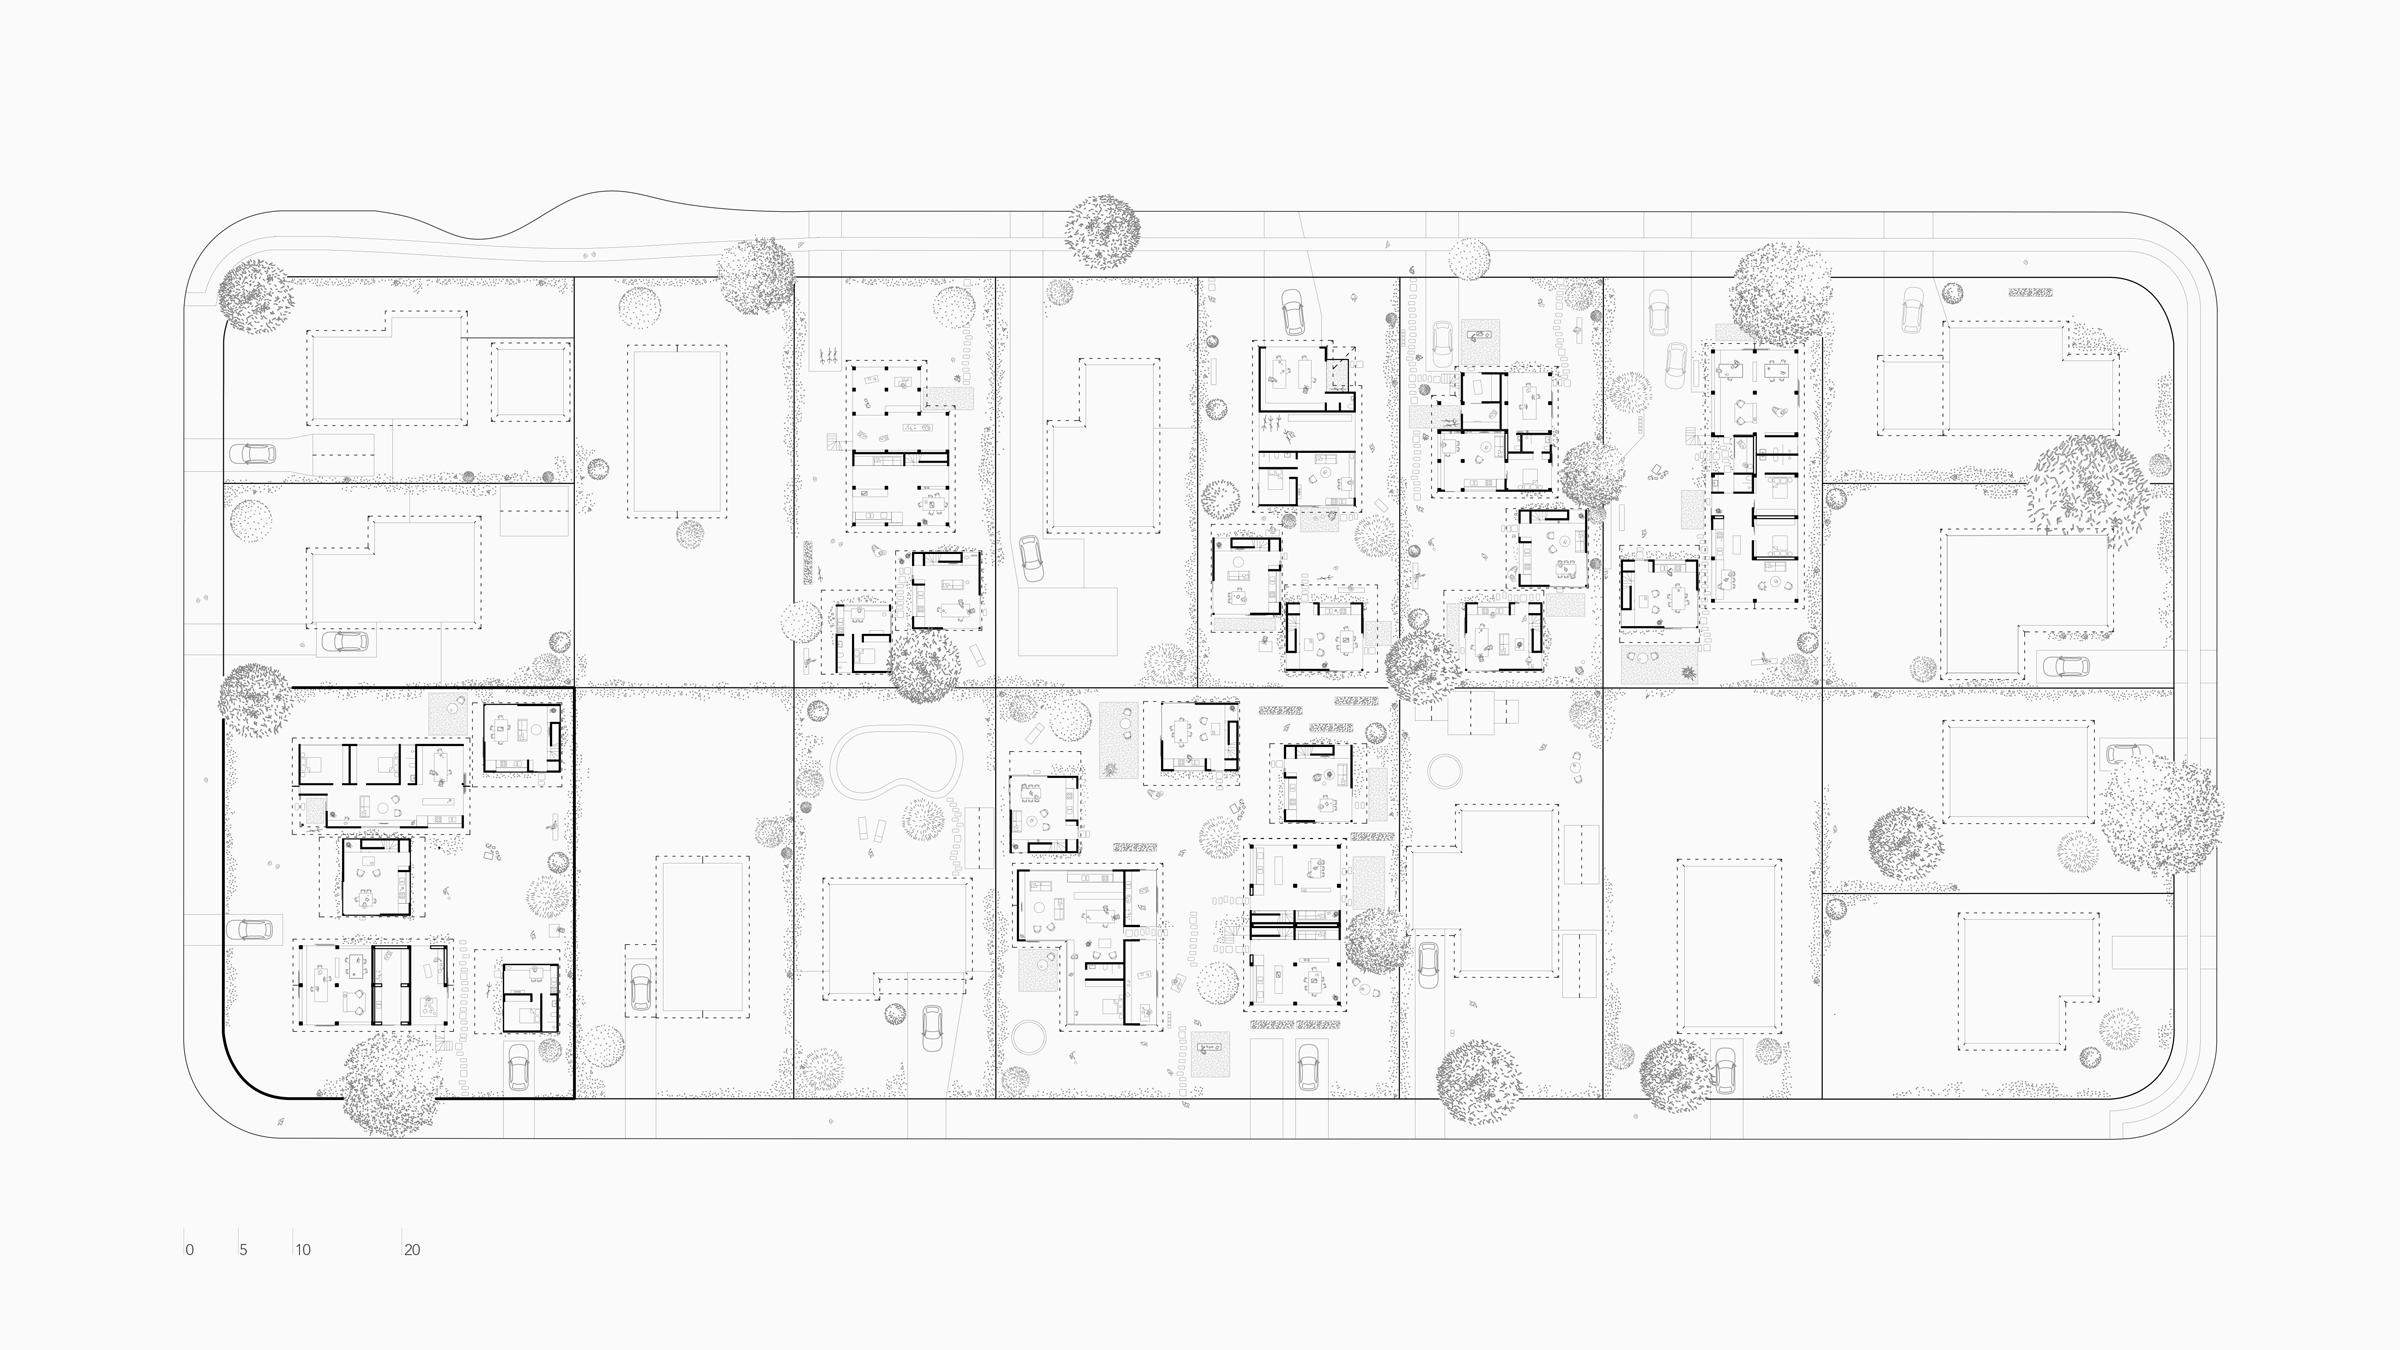 171212-Dappled-Dwellings-Site-Plan-Stage-05.jpg